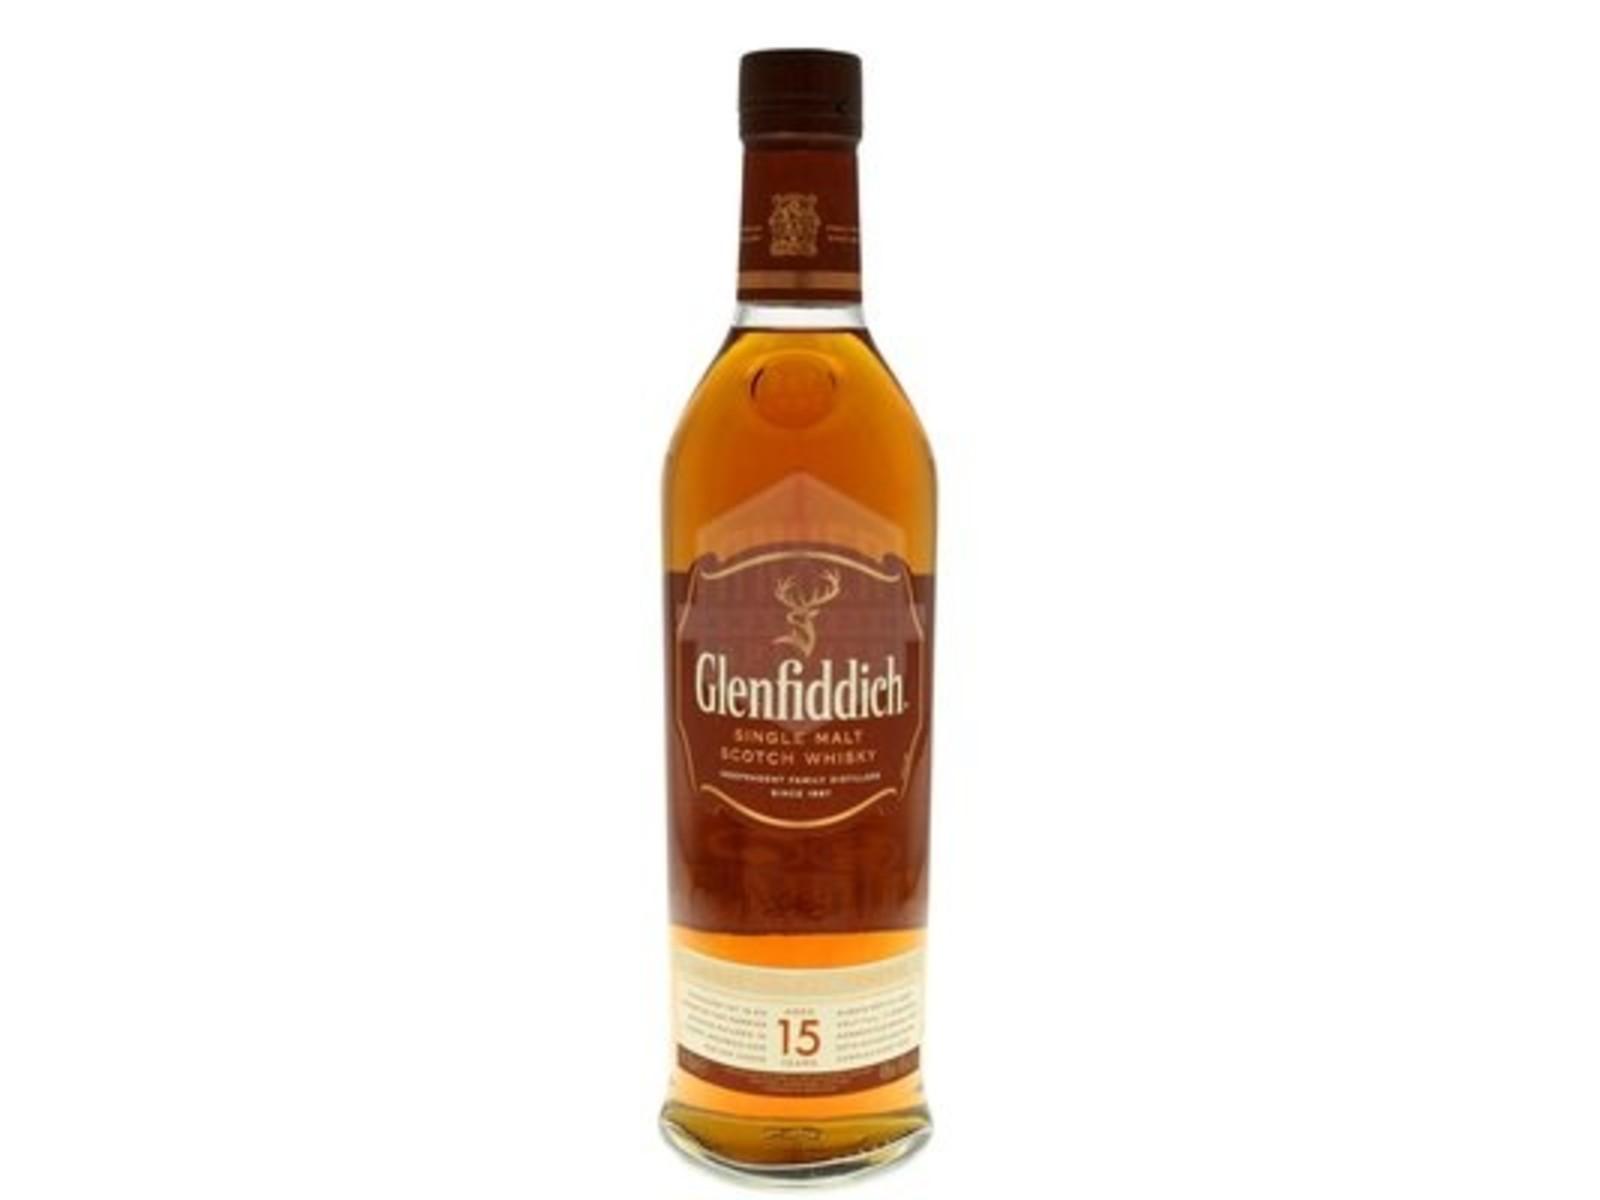 Glenfiddich Glenfiddich / 15 years / Unique Solera Fifteen / 0,7L